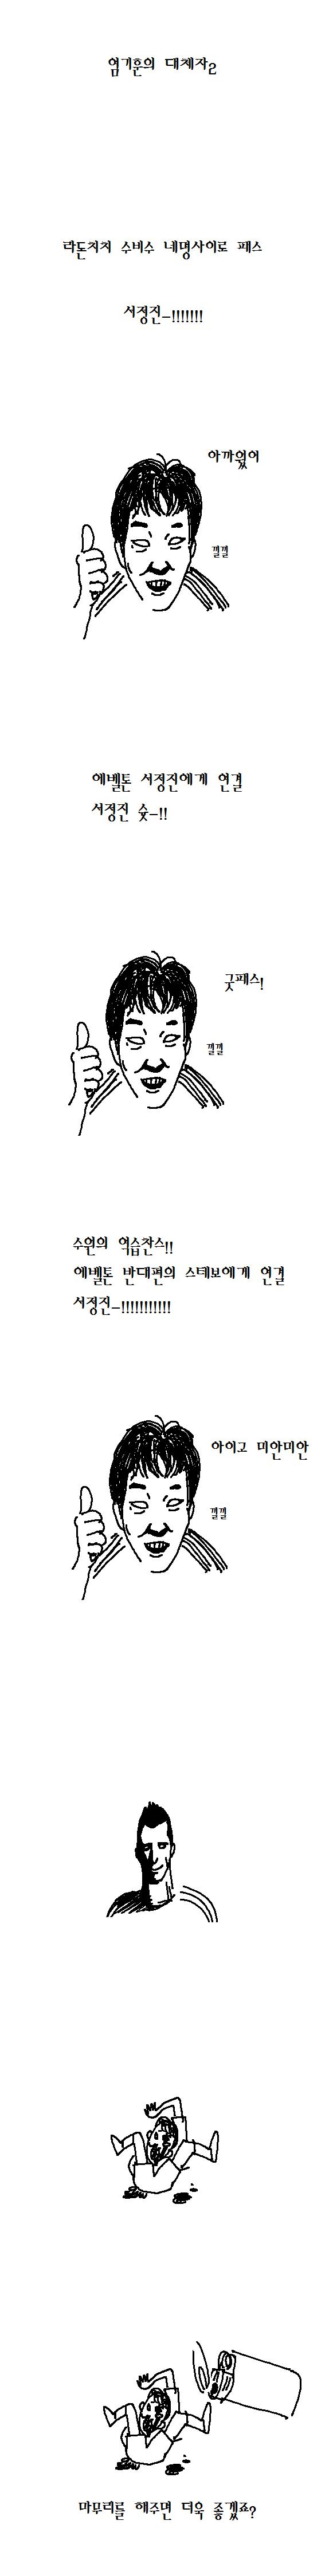 4.png : 아류 개랑툰 2화